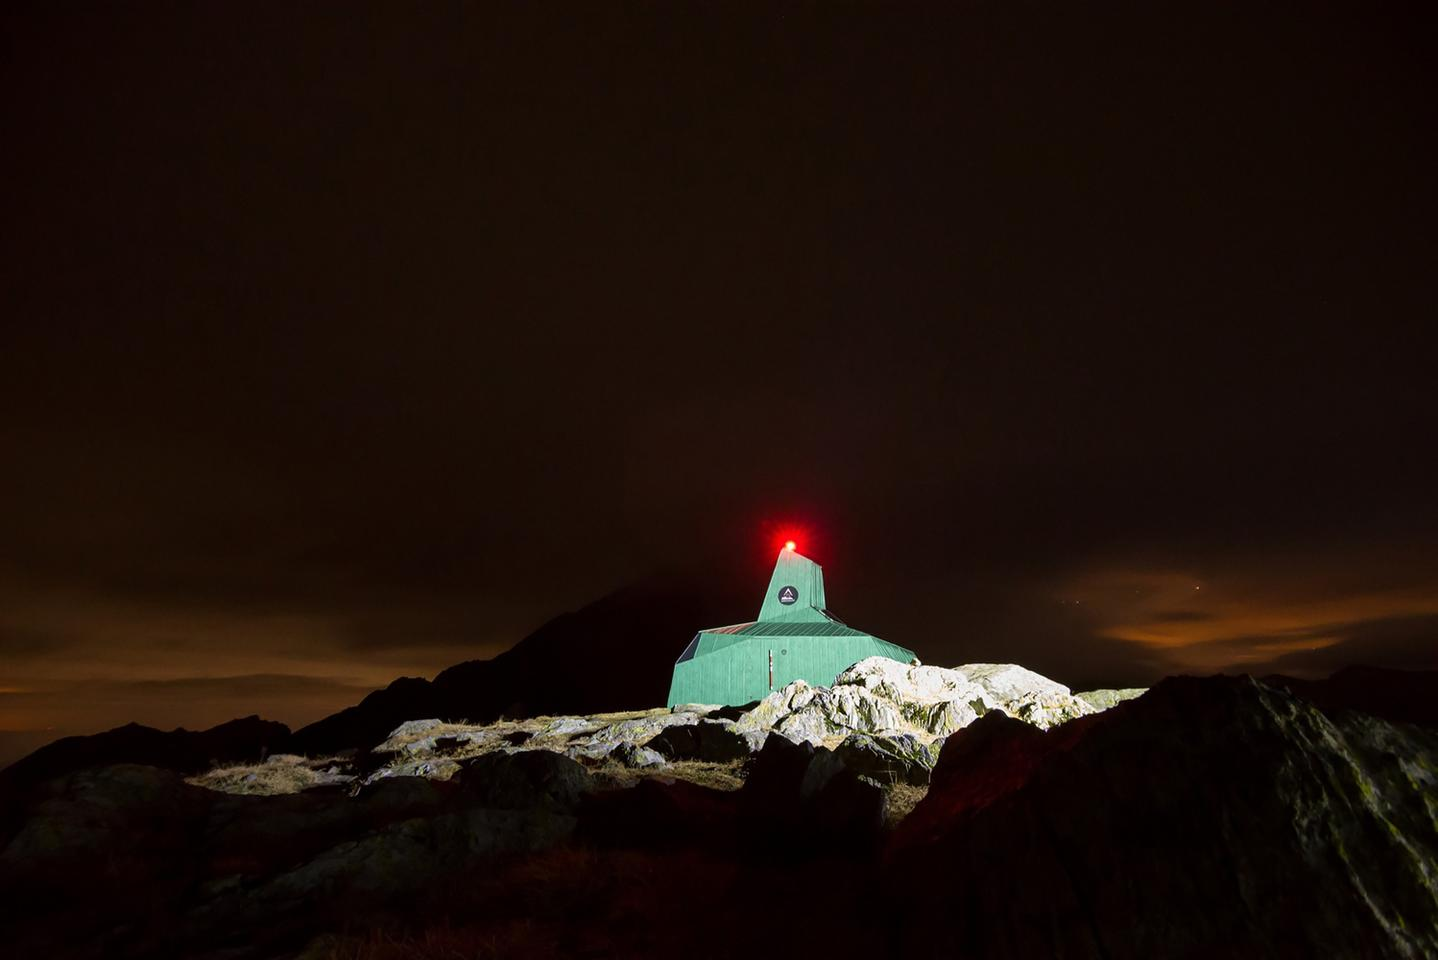 Off-grid mountain refuge provides shelter at high-altitude